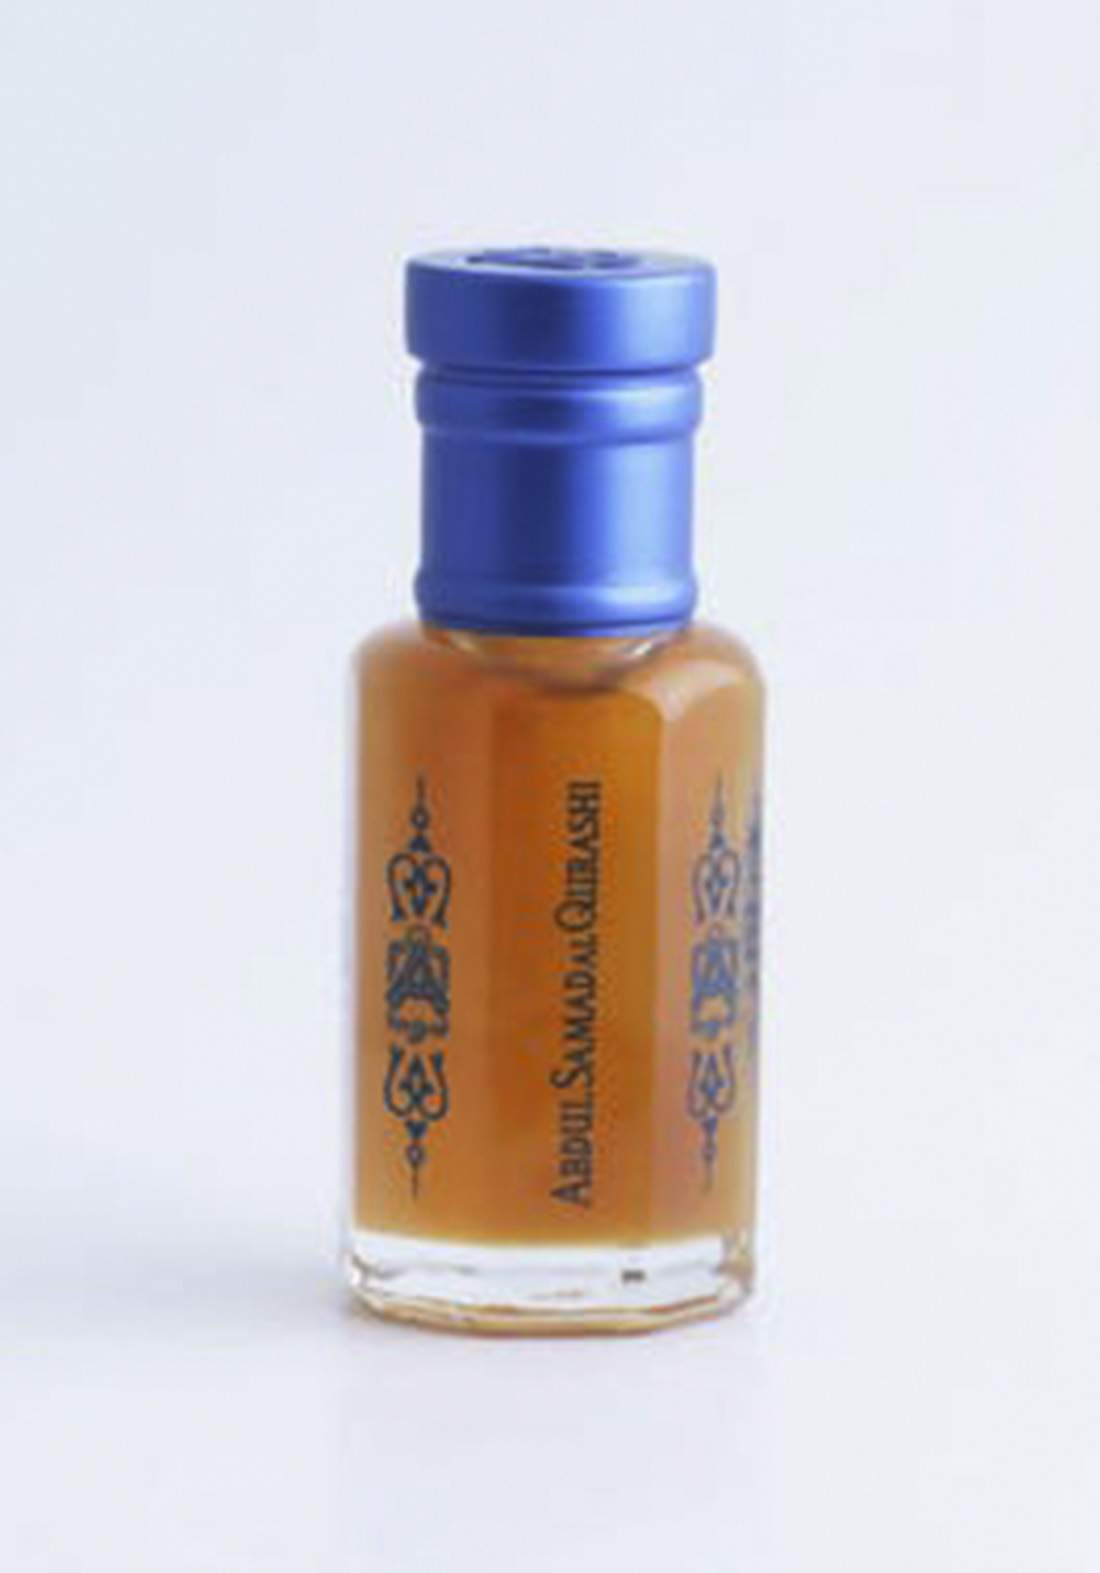 Abdul Samad Al Qurashi13056 musk for the body Mix Perfume Oil 12g  عطر زيتي